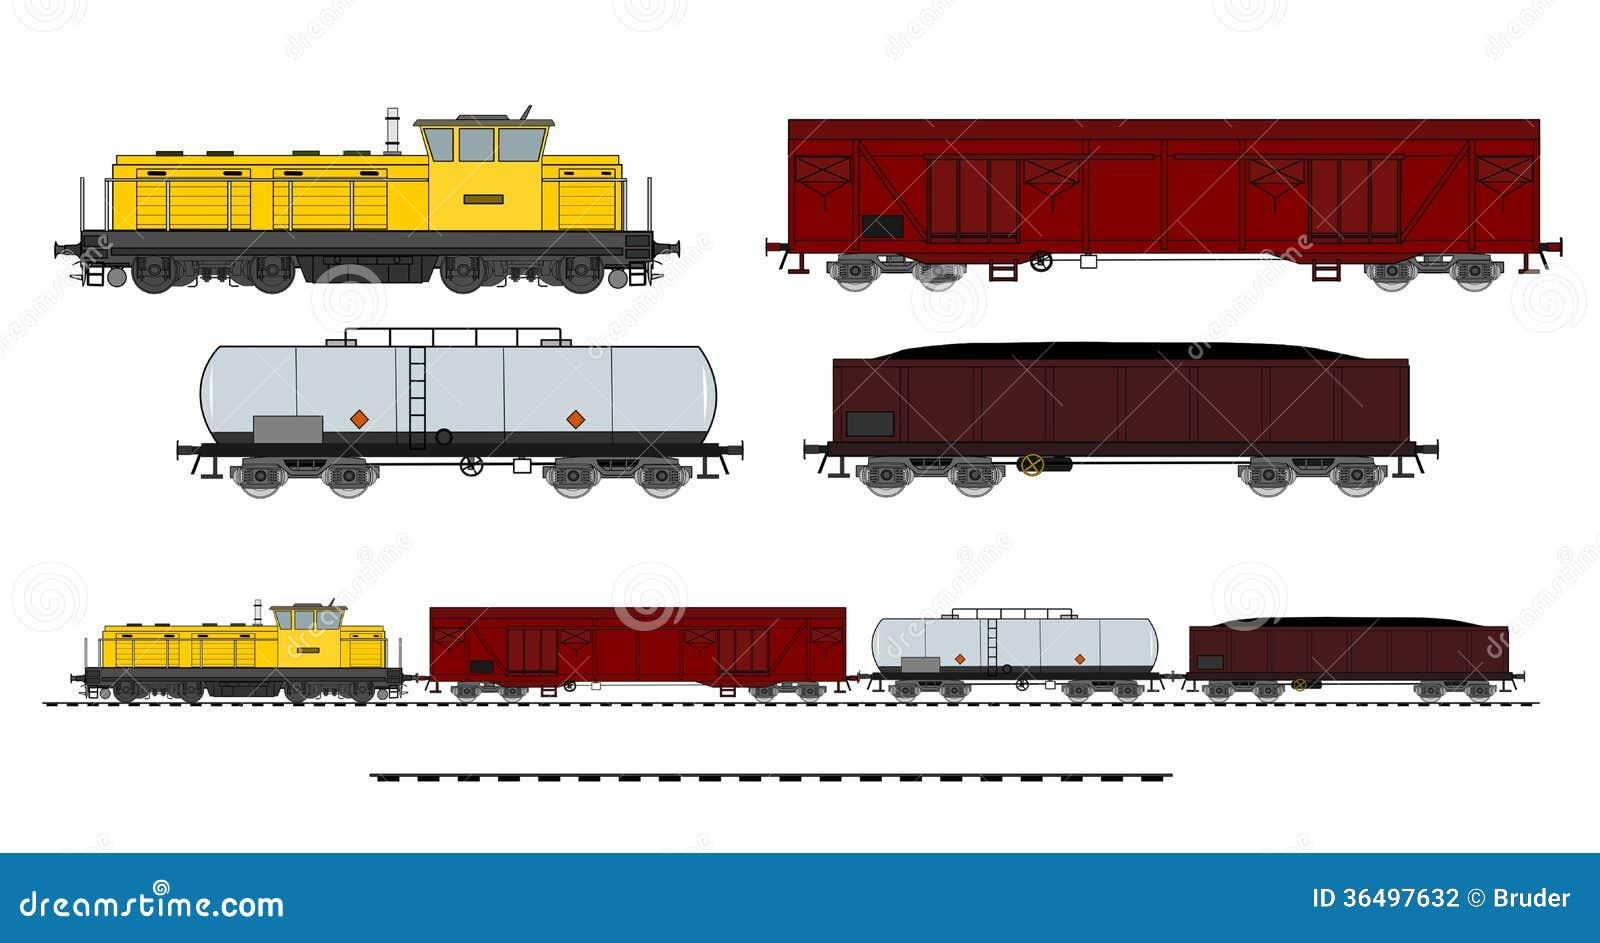 Cargo train stock vector. Image of metal, mining, vector ...